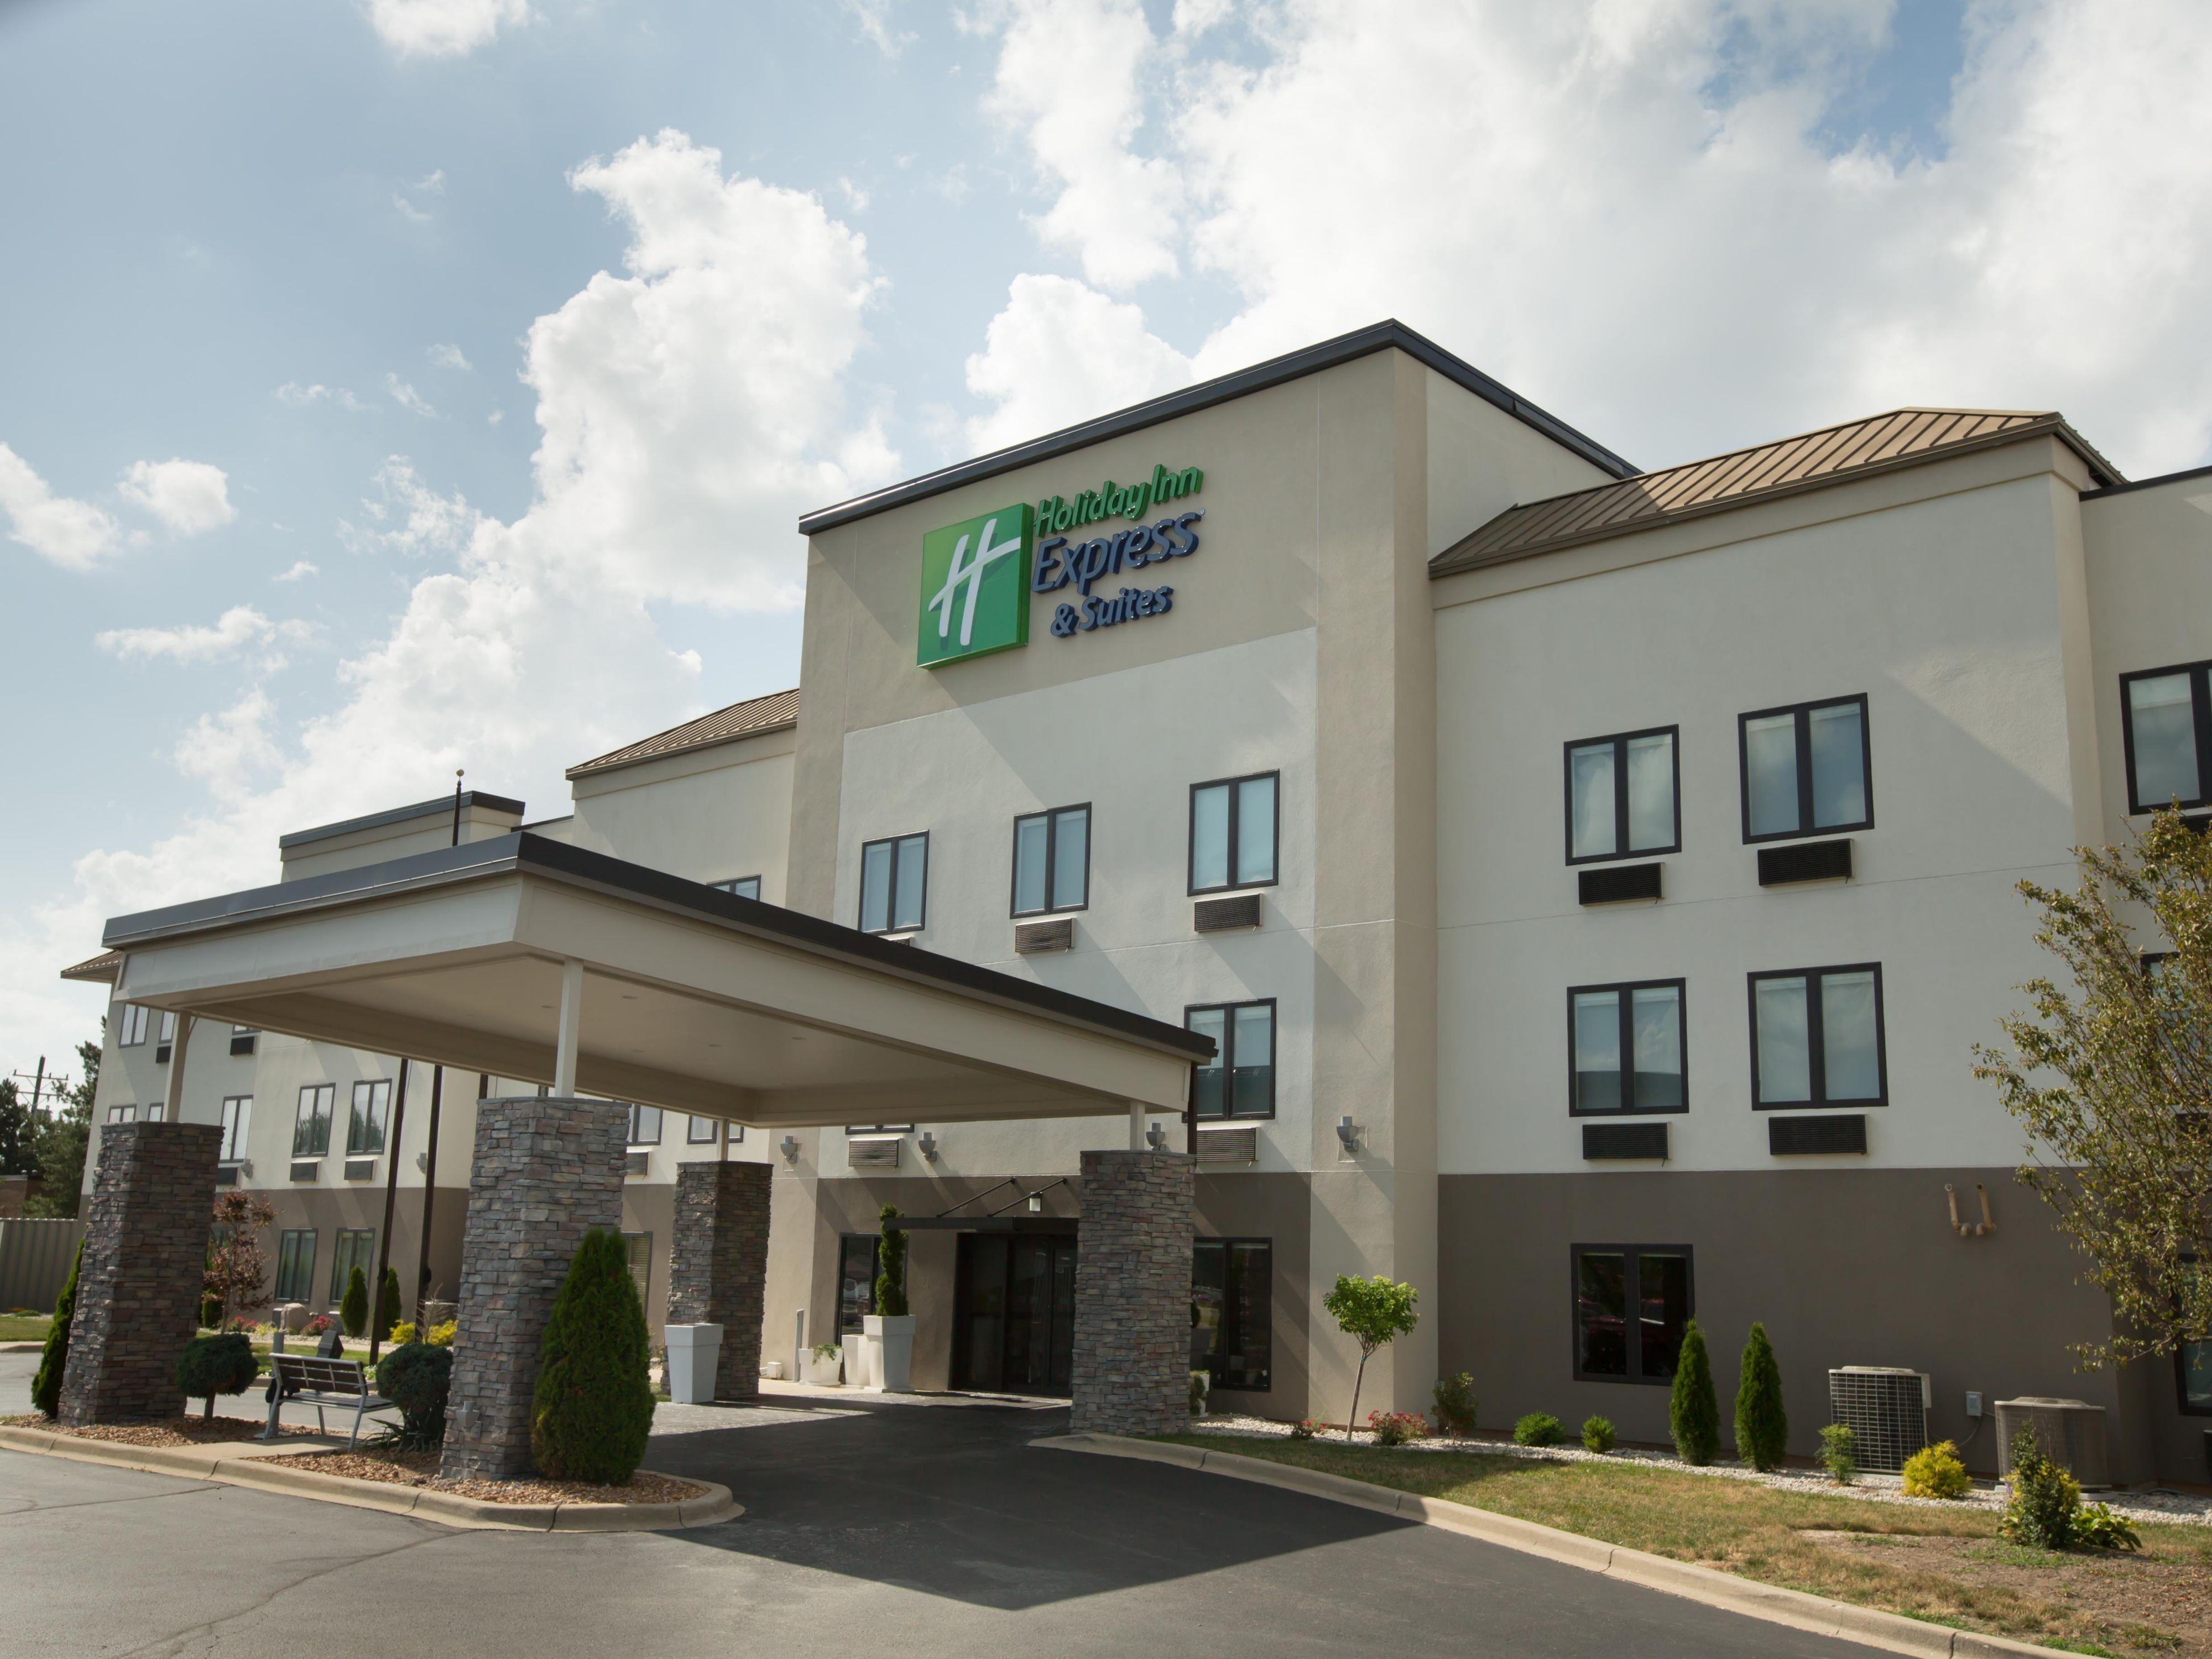 Brilliant Holiday Inn Express Suites Madison Ihg Hotel Download Free Architecture Designs Scobabritishbridgeorg